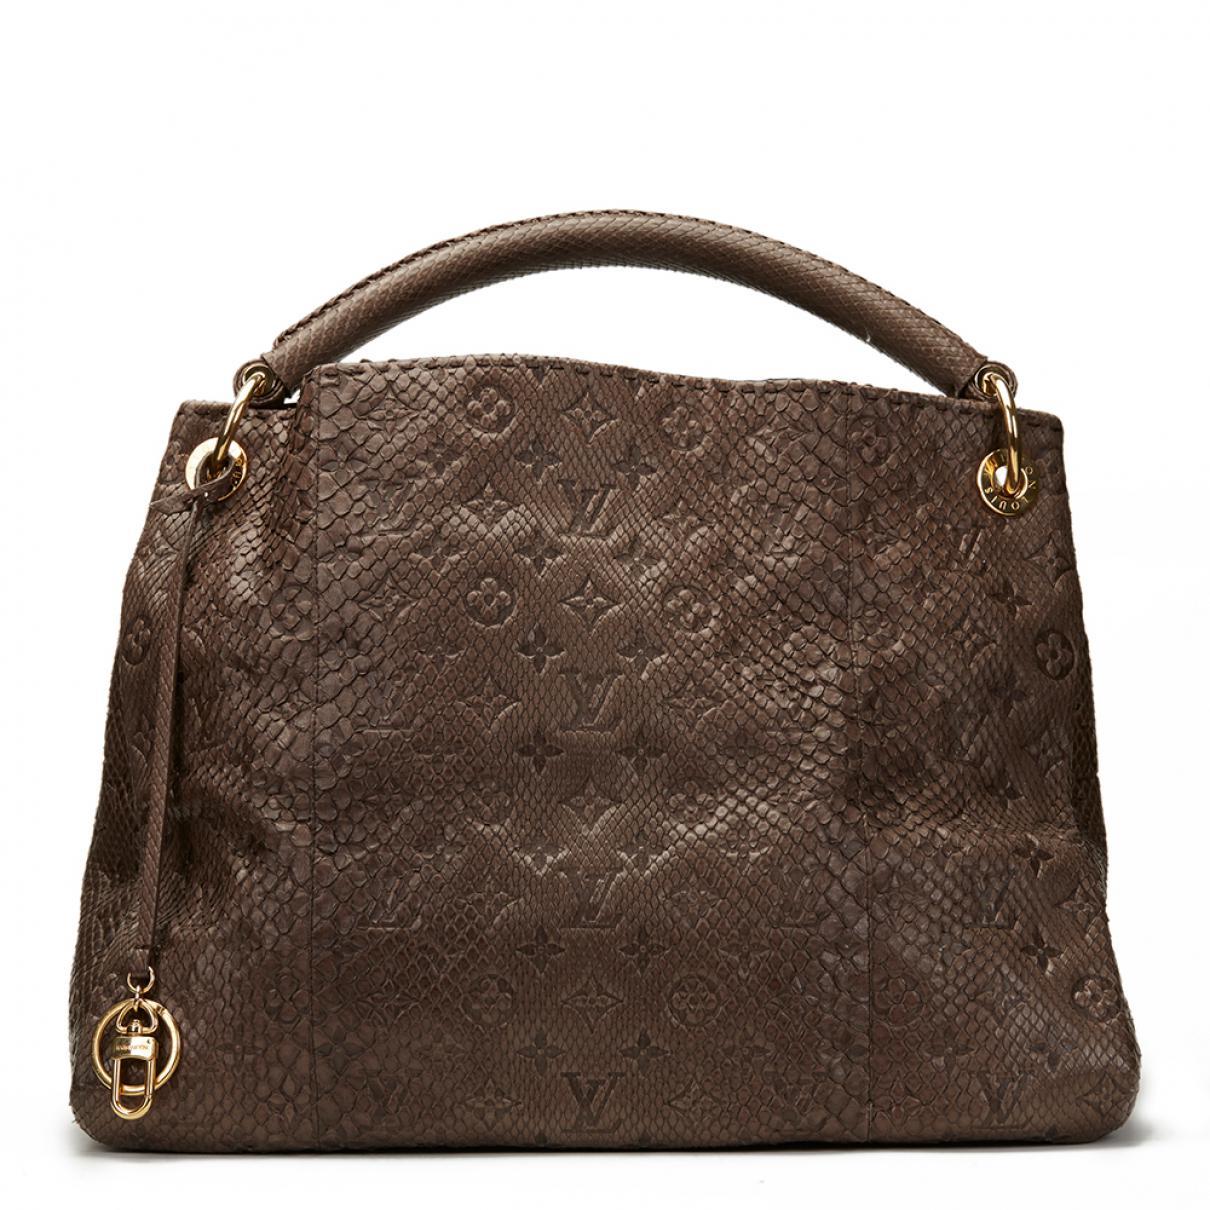 Pre-owned - Python handbag Louis Vuitton gSiMFCn